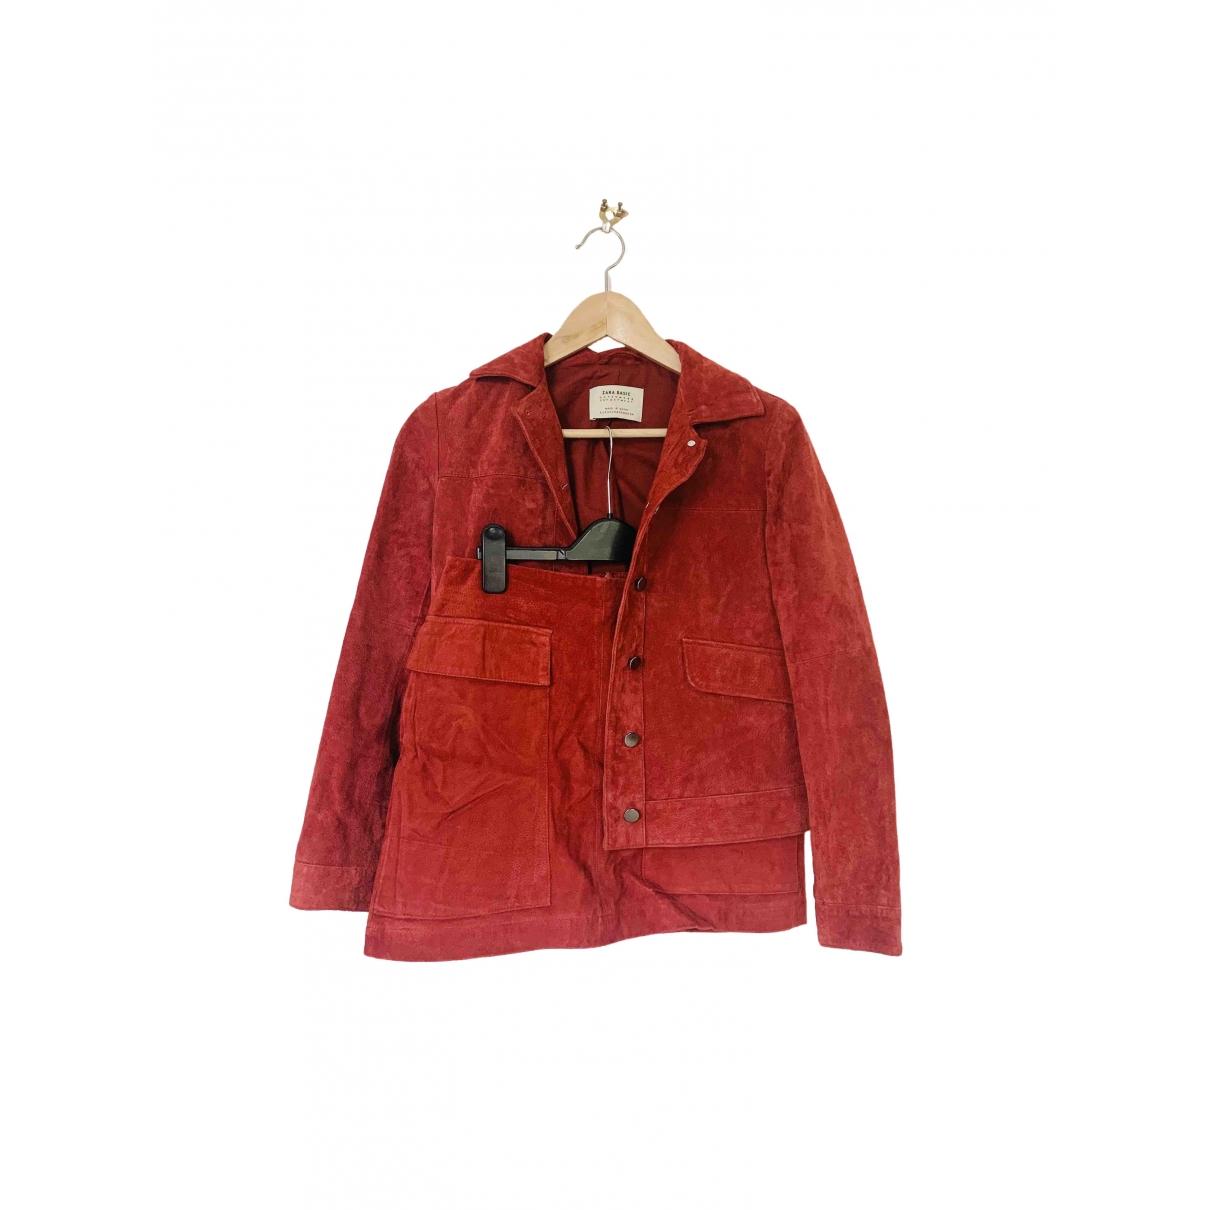 Zara \N Red Suede jacket for Women XS International